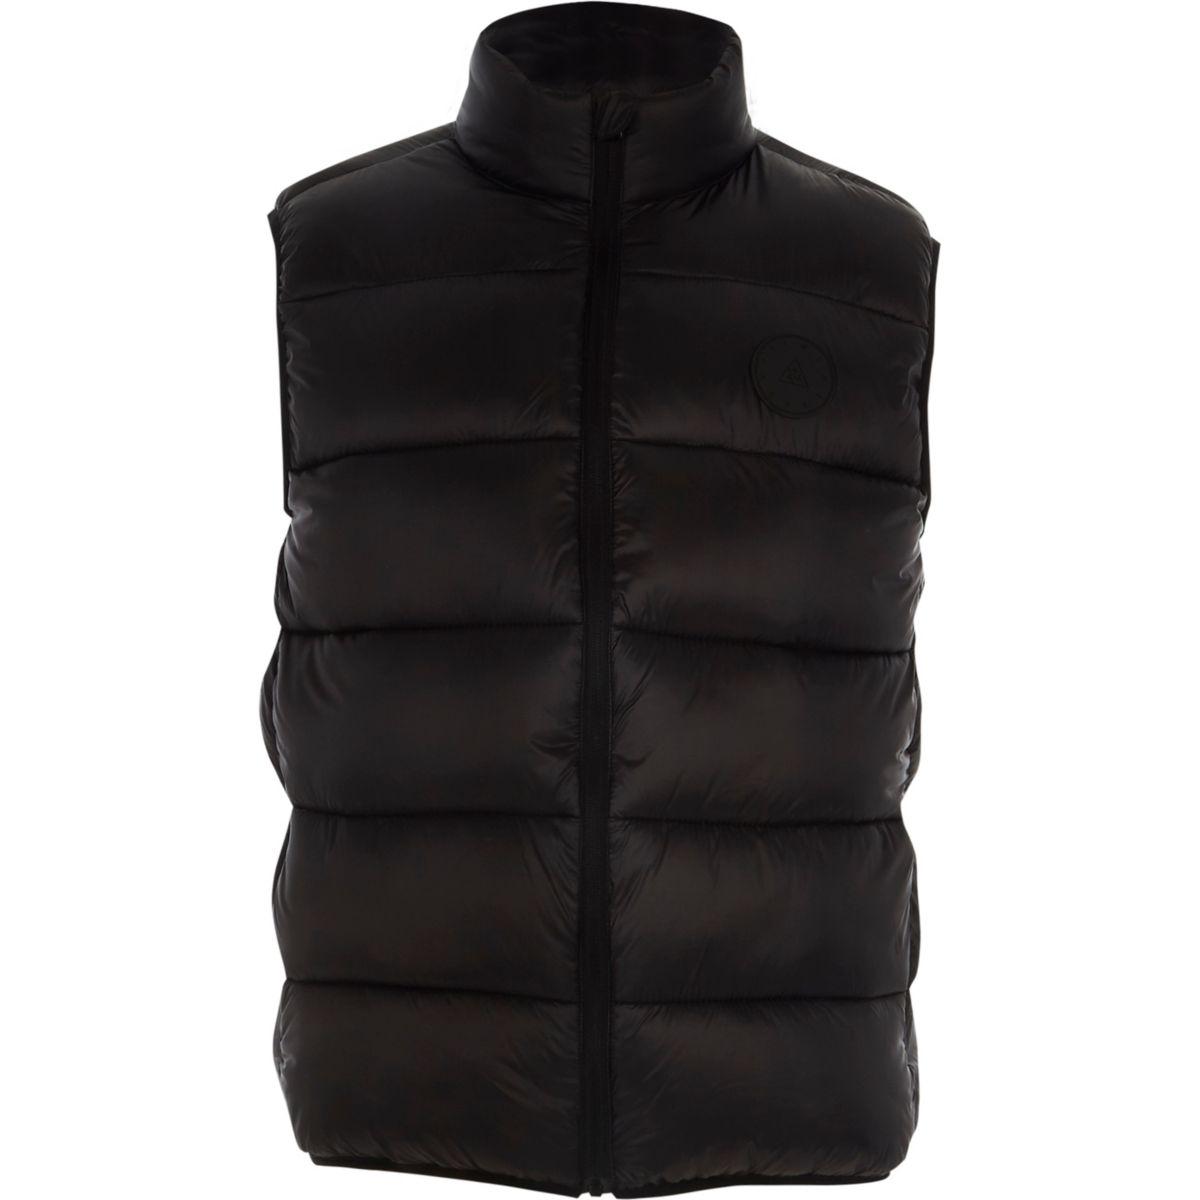 Black puffer vest